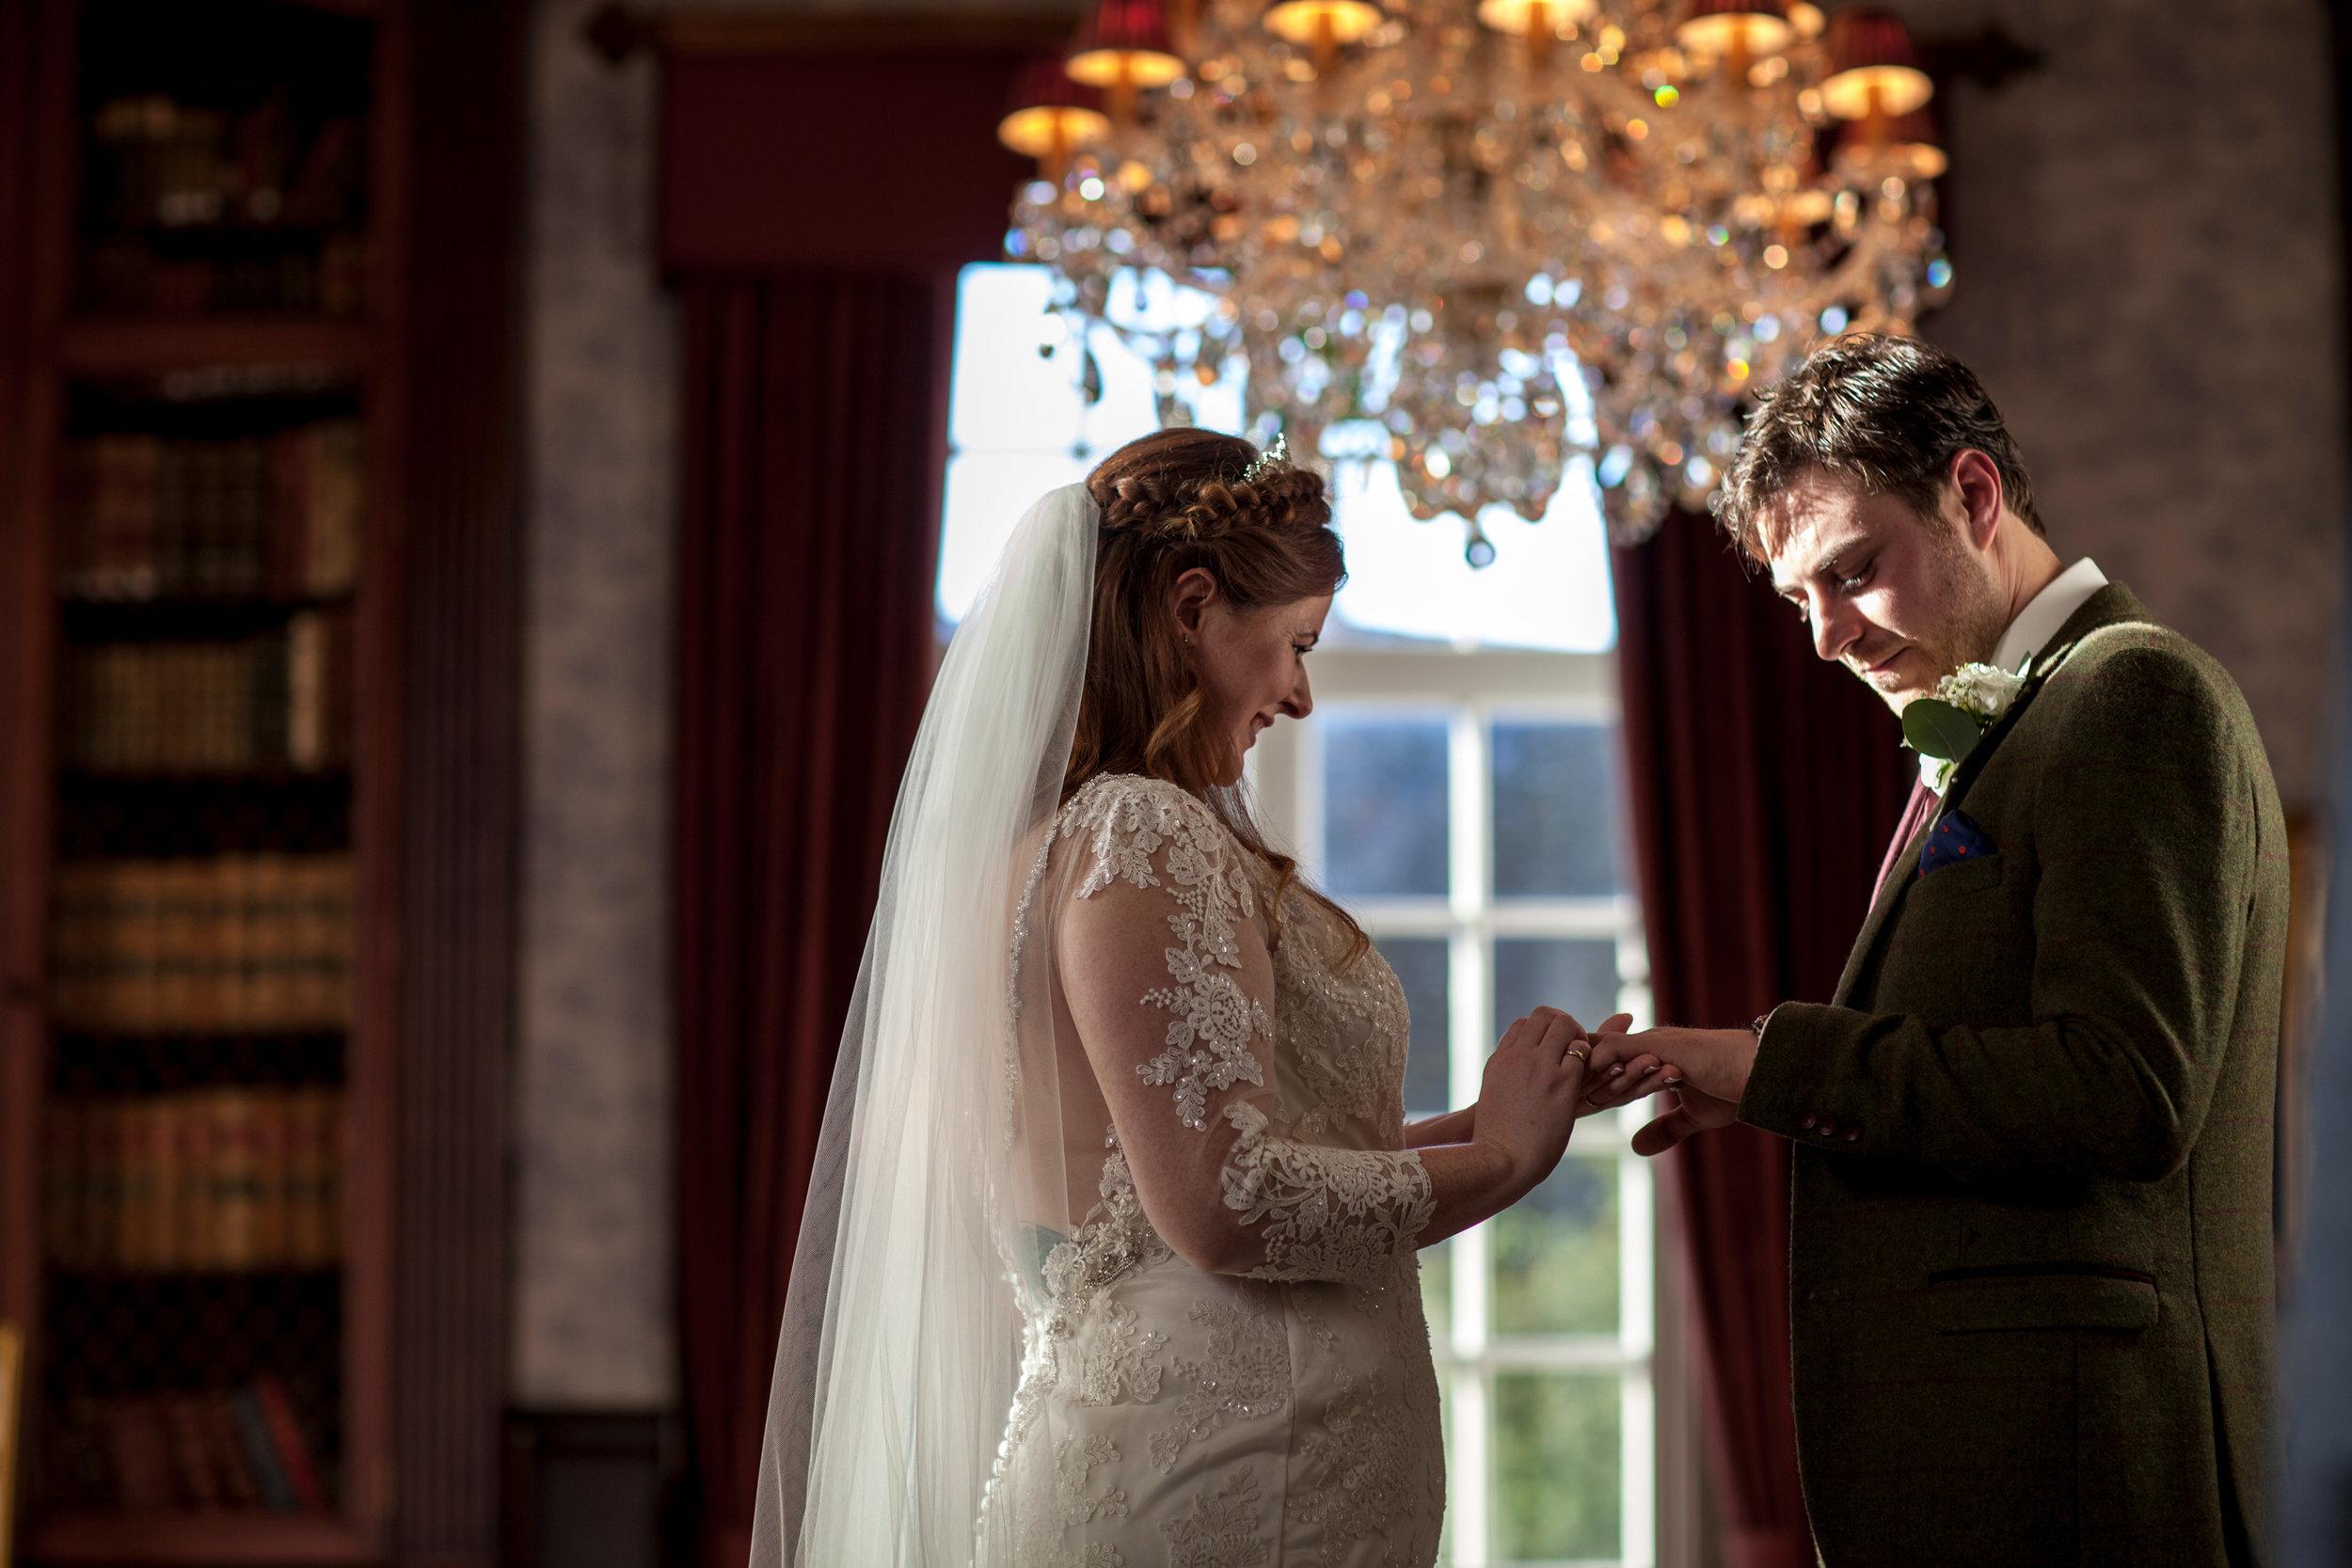 Ring Ceremony, Country House Wedding, Autumn Wedding, Bedfordshire Wedding,